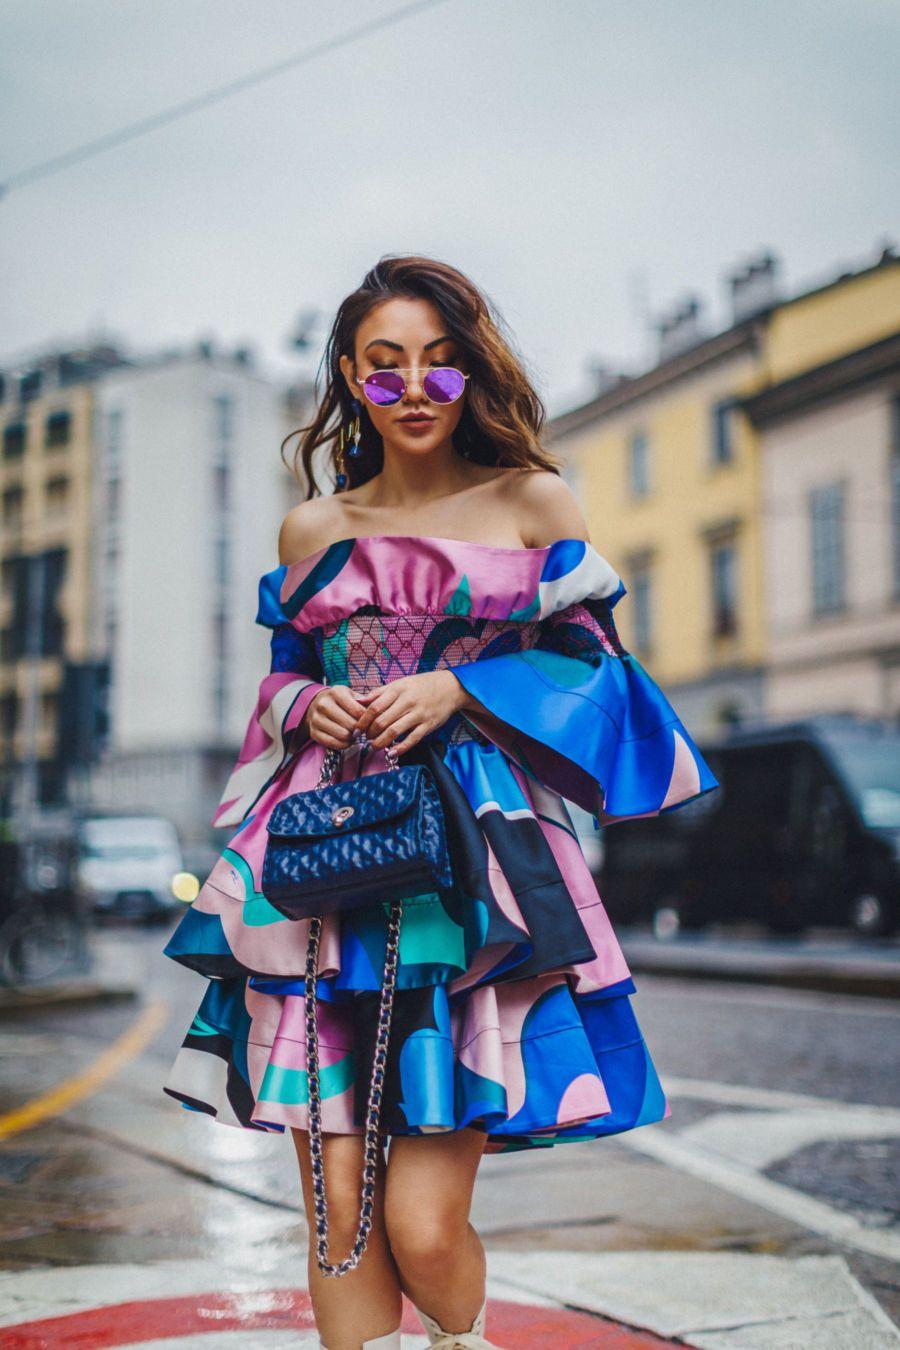 dd8aeb2ca SHOPBOP Sale Alert - The Best Spring & Summer Women's Fashion Items ...